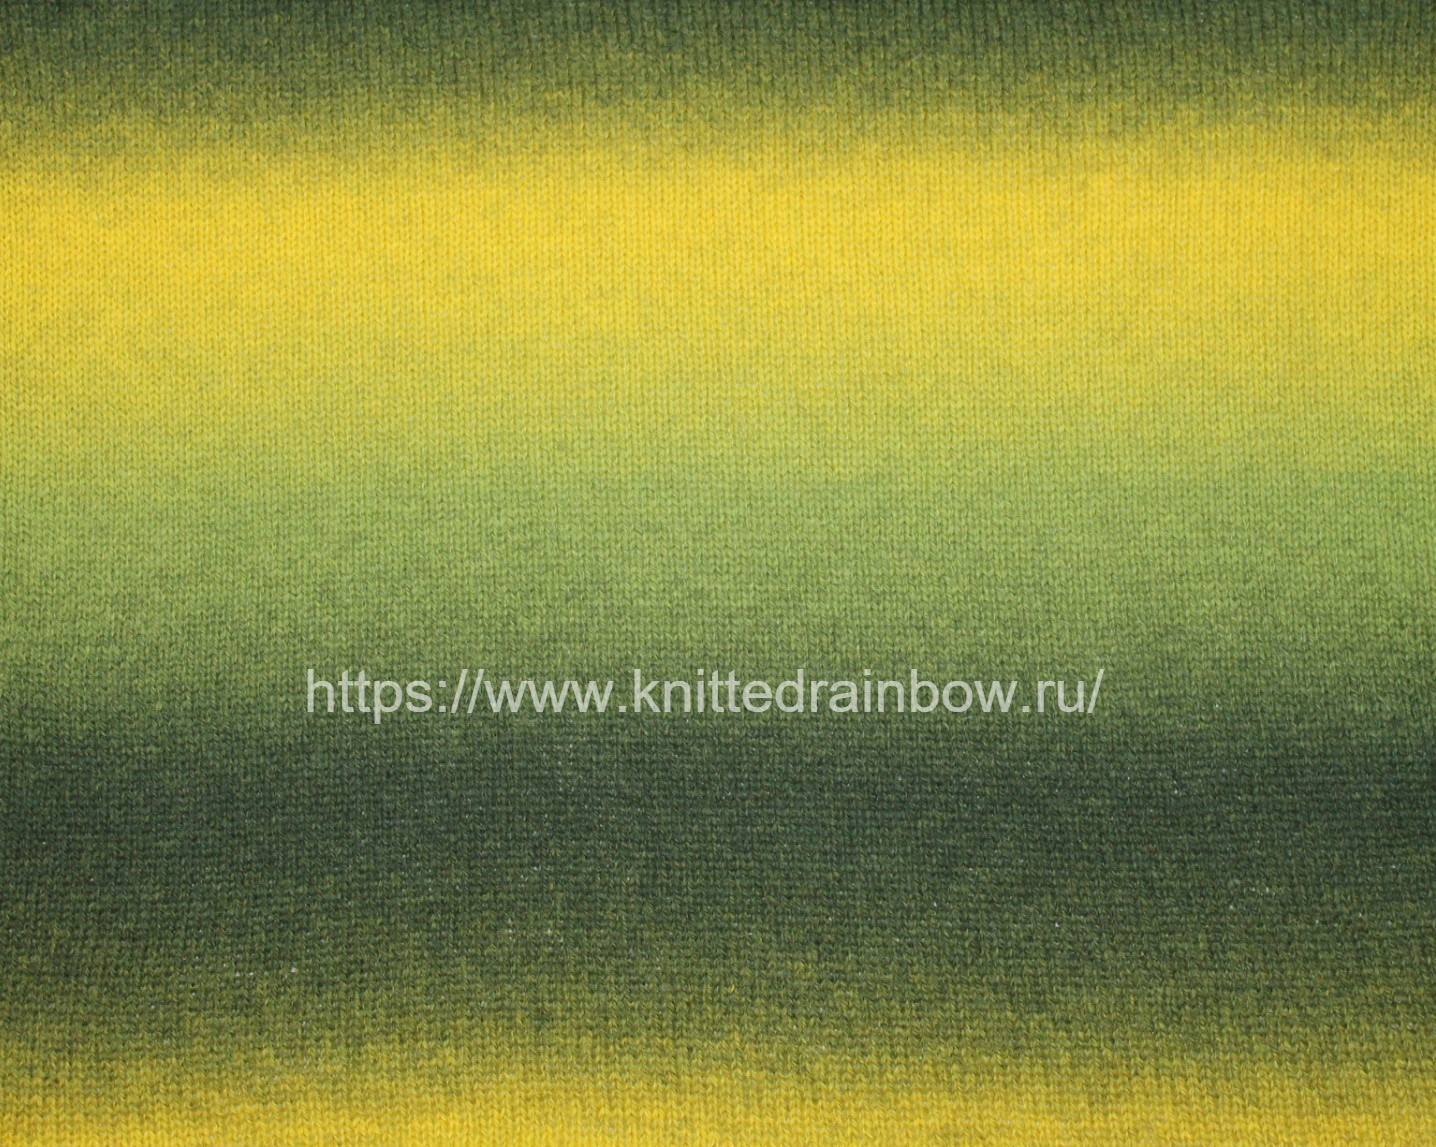 Водн знак сайт Yellow-green в полотне